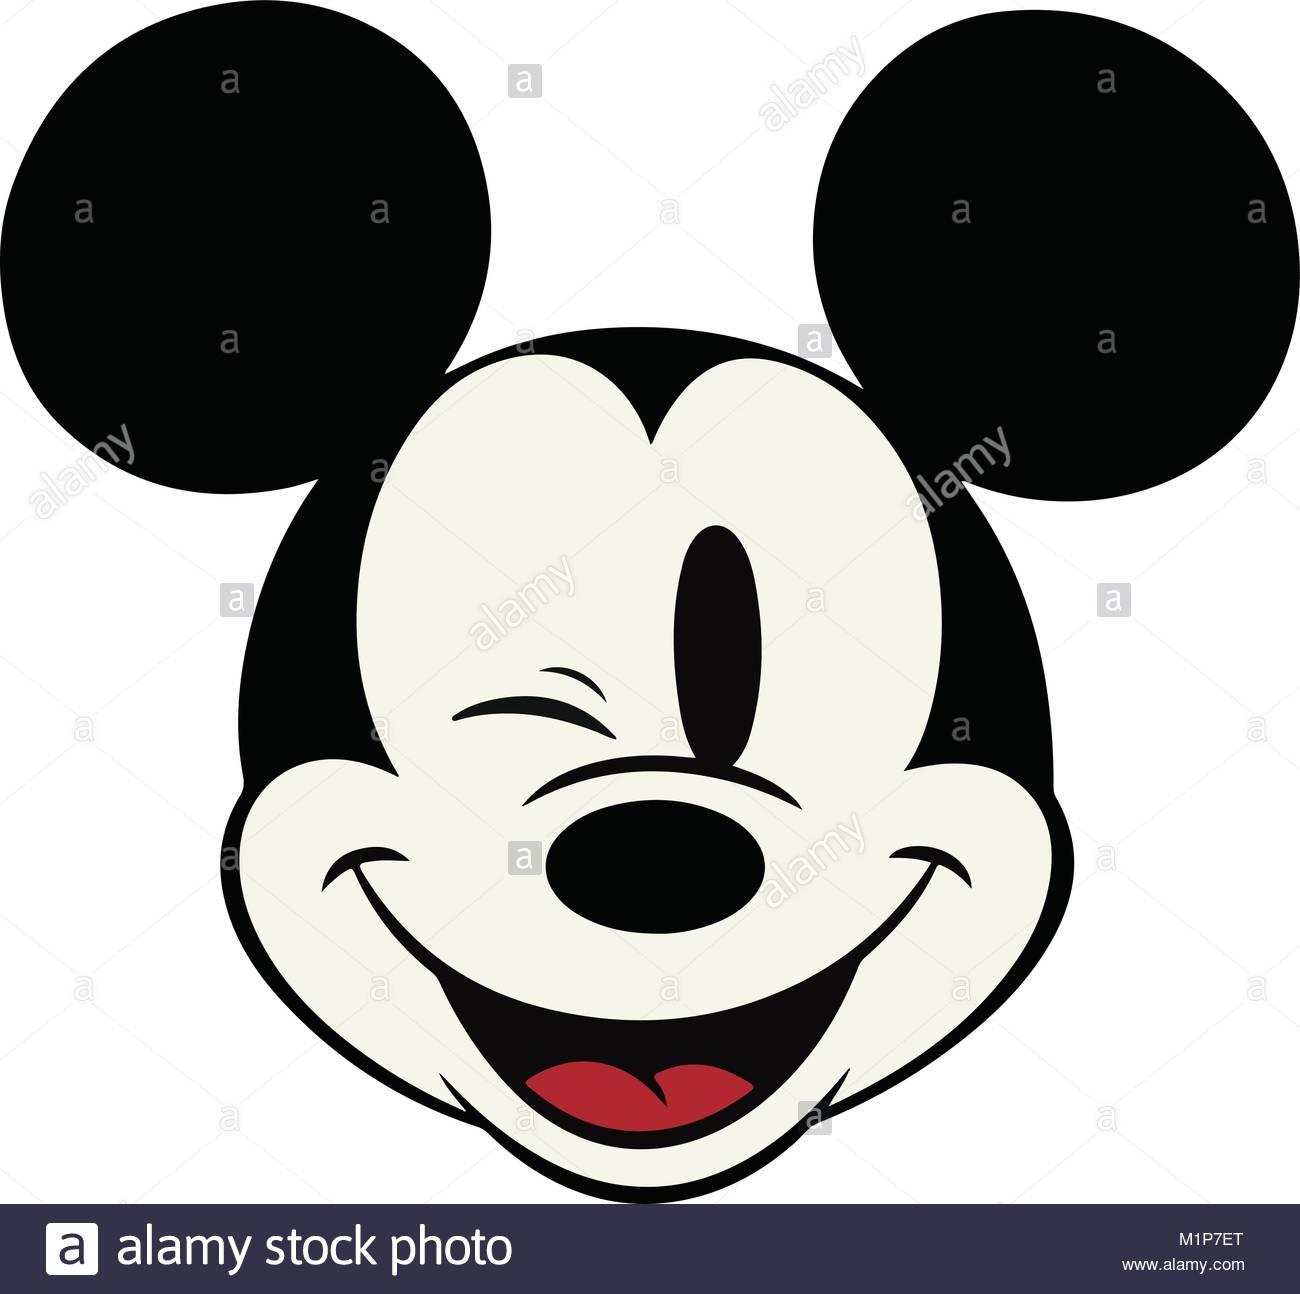 mickey mouse k nnen gedruckt werden skaliert auf beliebiges format scalable vector vektor. Black Bedroom Furniture Sets. Home Design Ideas